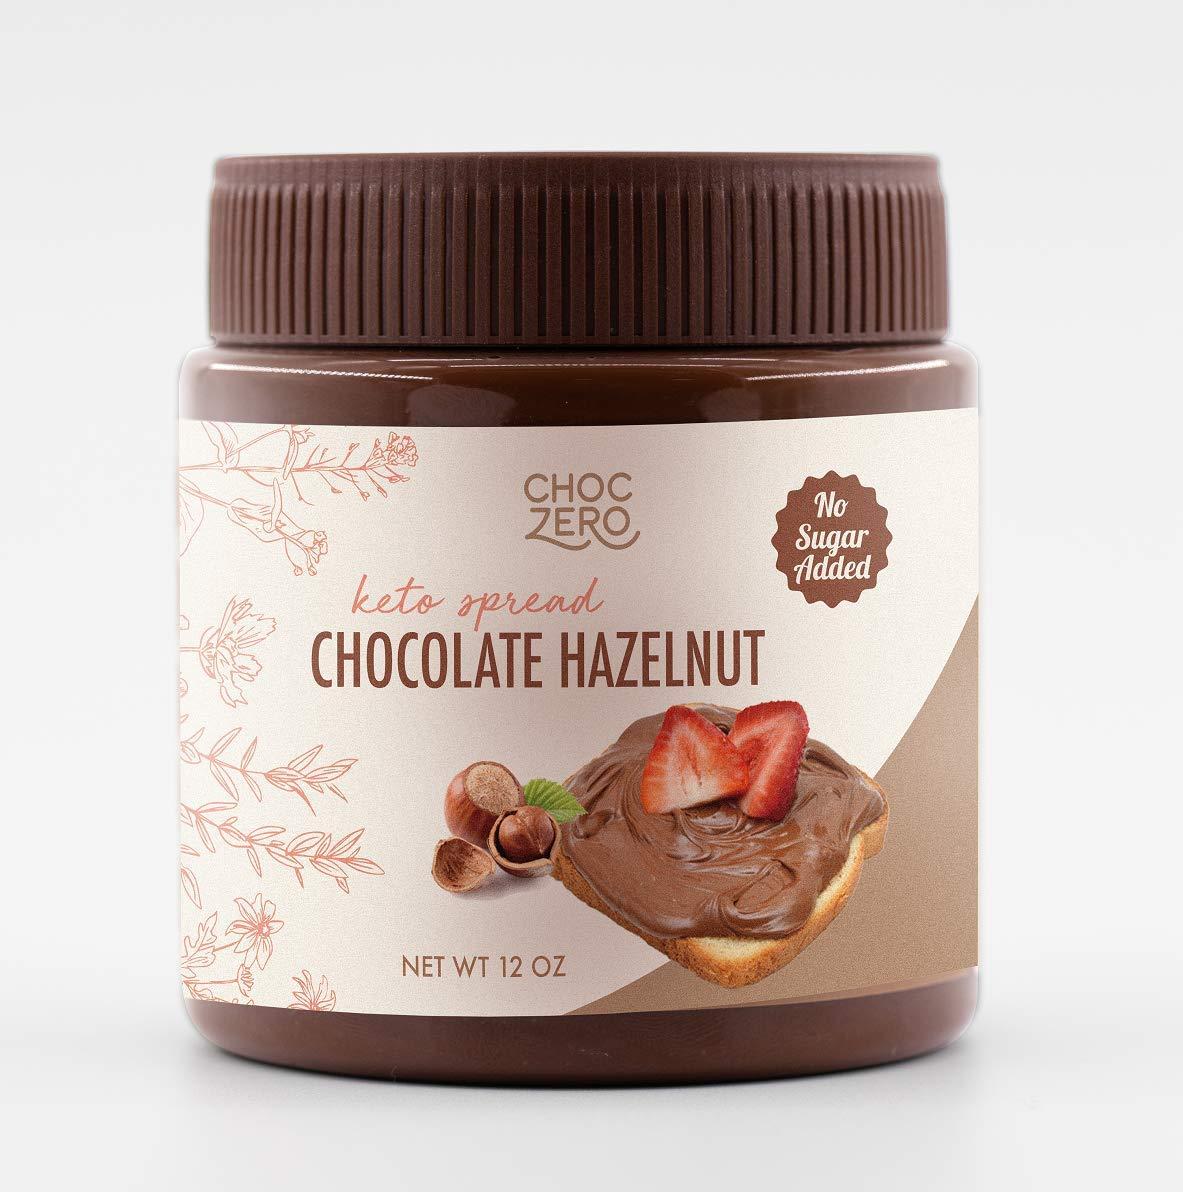 ChocZero Keto Milk Chocolate Hazelnut Spread - Keto Friendly, No Sugar Added, Best Low Carb Dessert, Perfect Topping for Almond Flour Pancakes, Naturally Sweetened with Monk Fruit (1 jar, 12 oz)